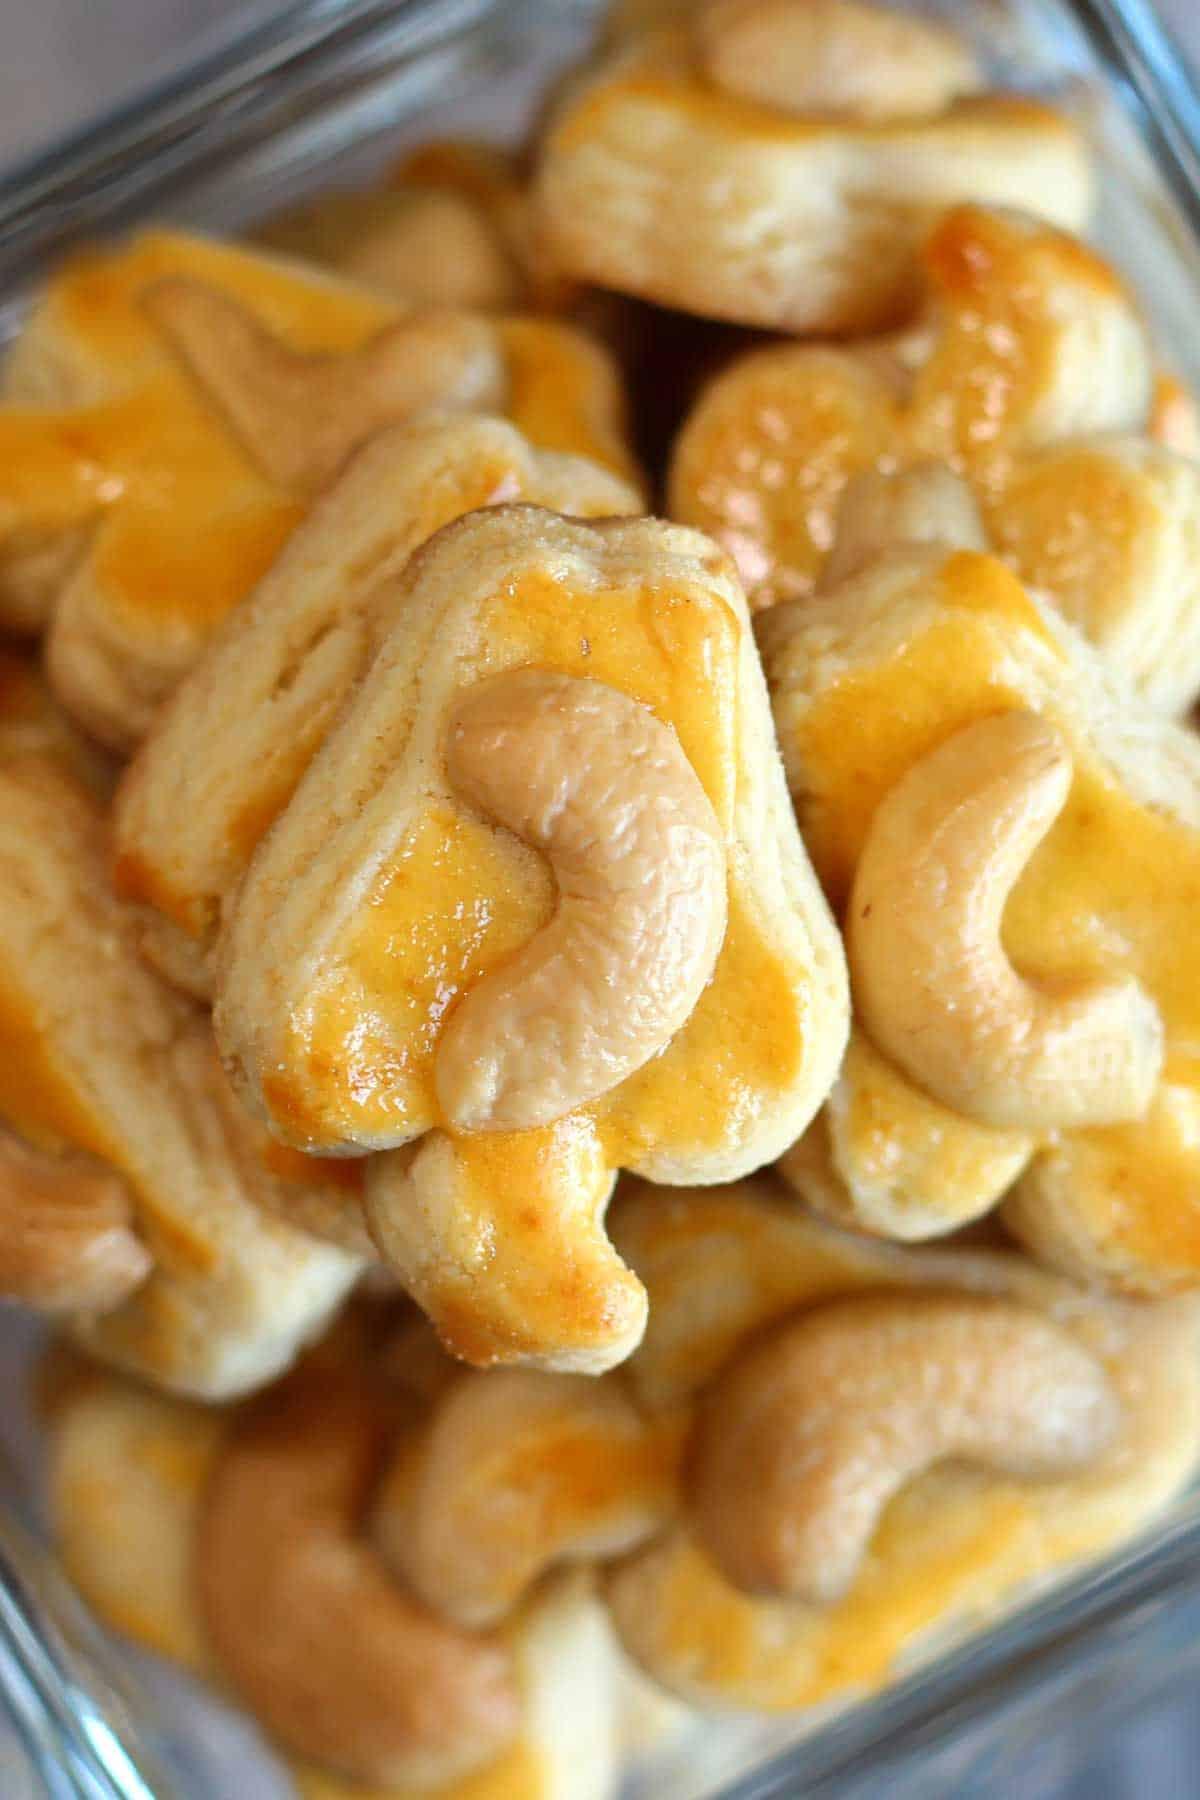 Cashew nut cookies in a jar